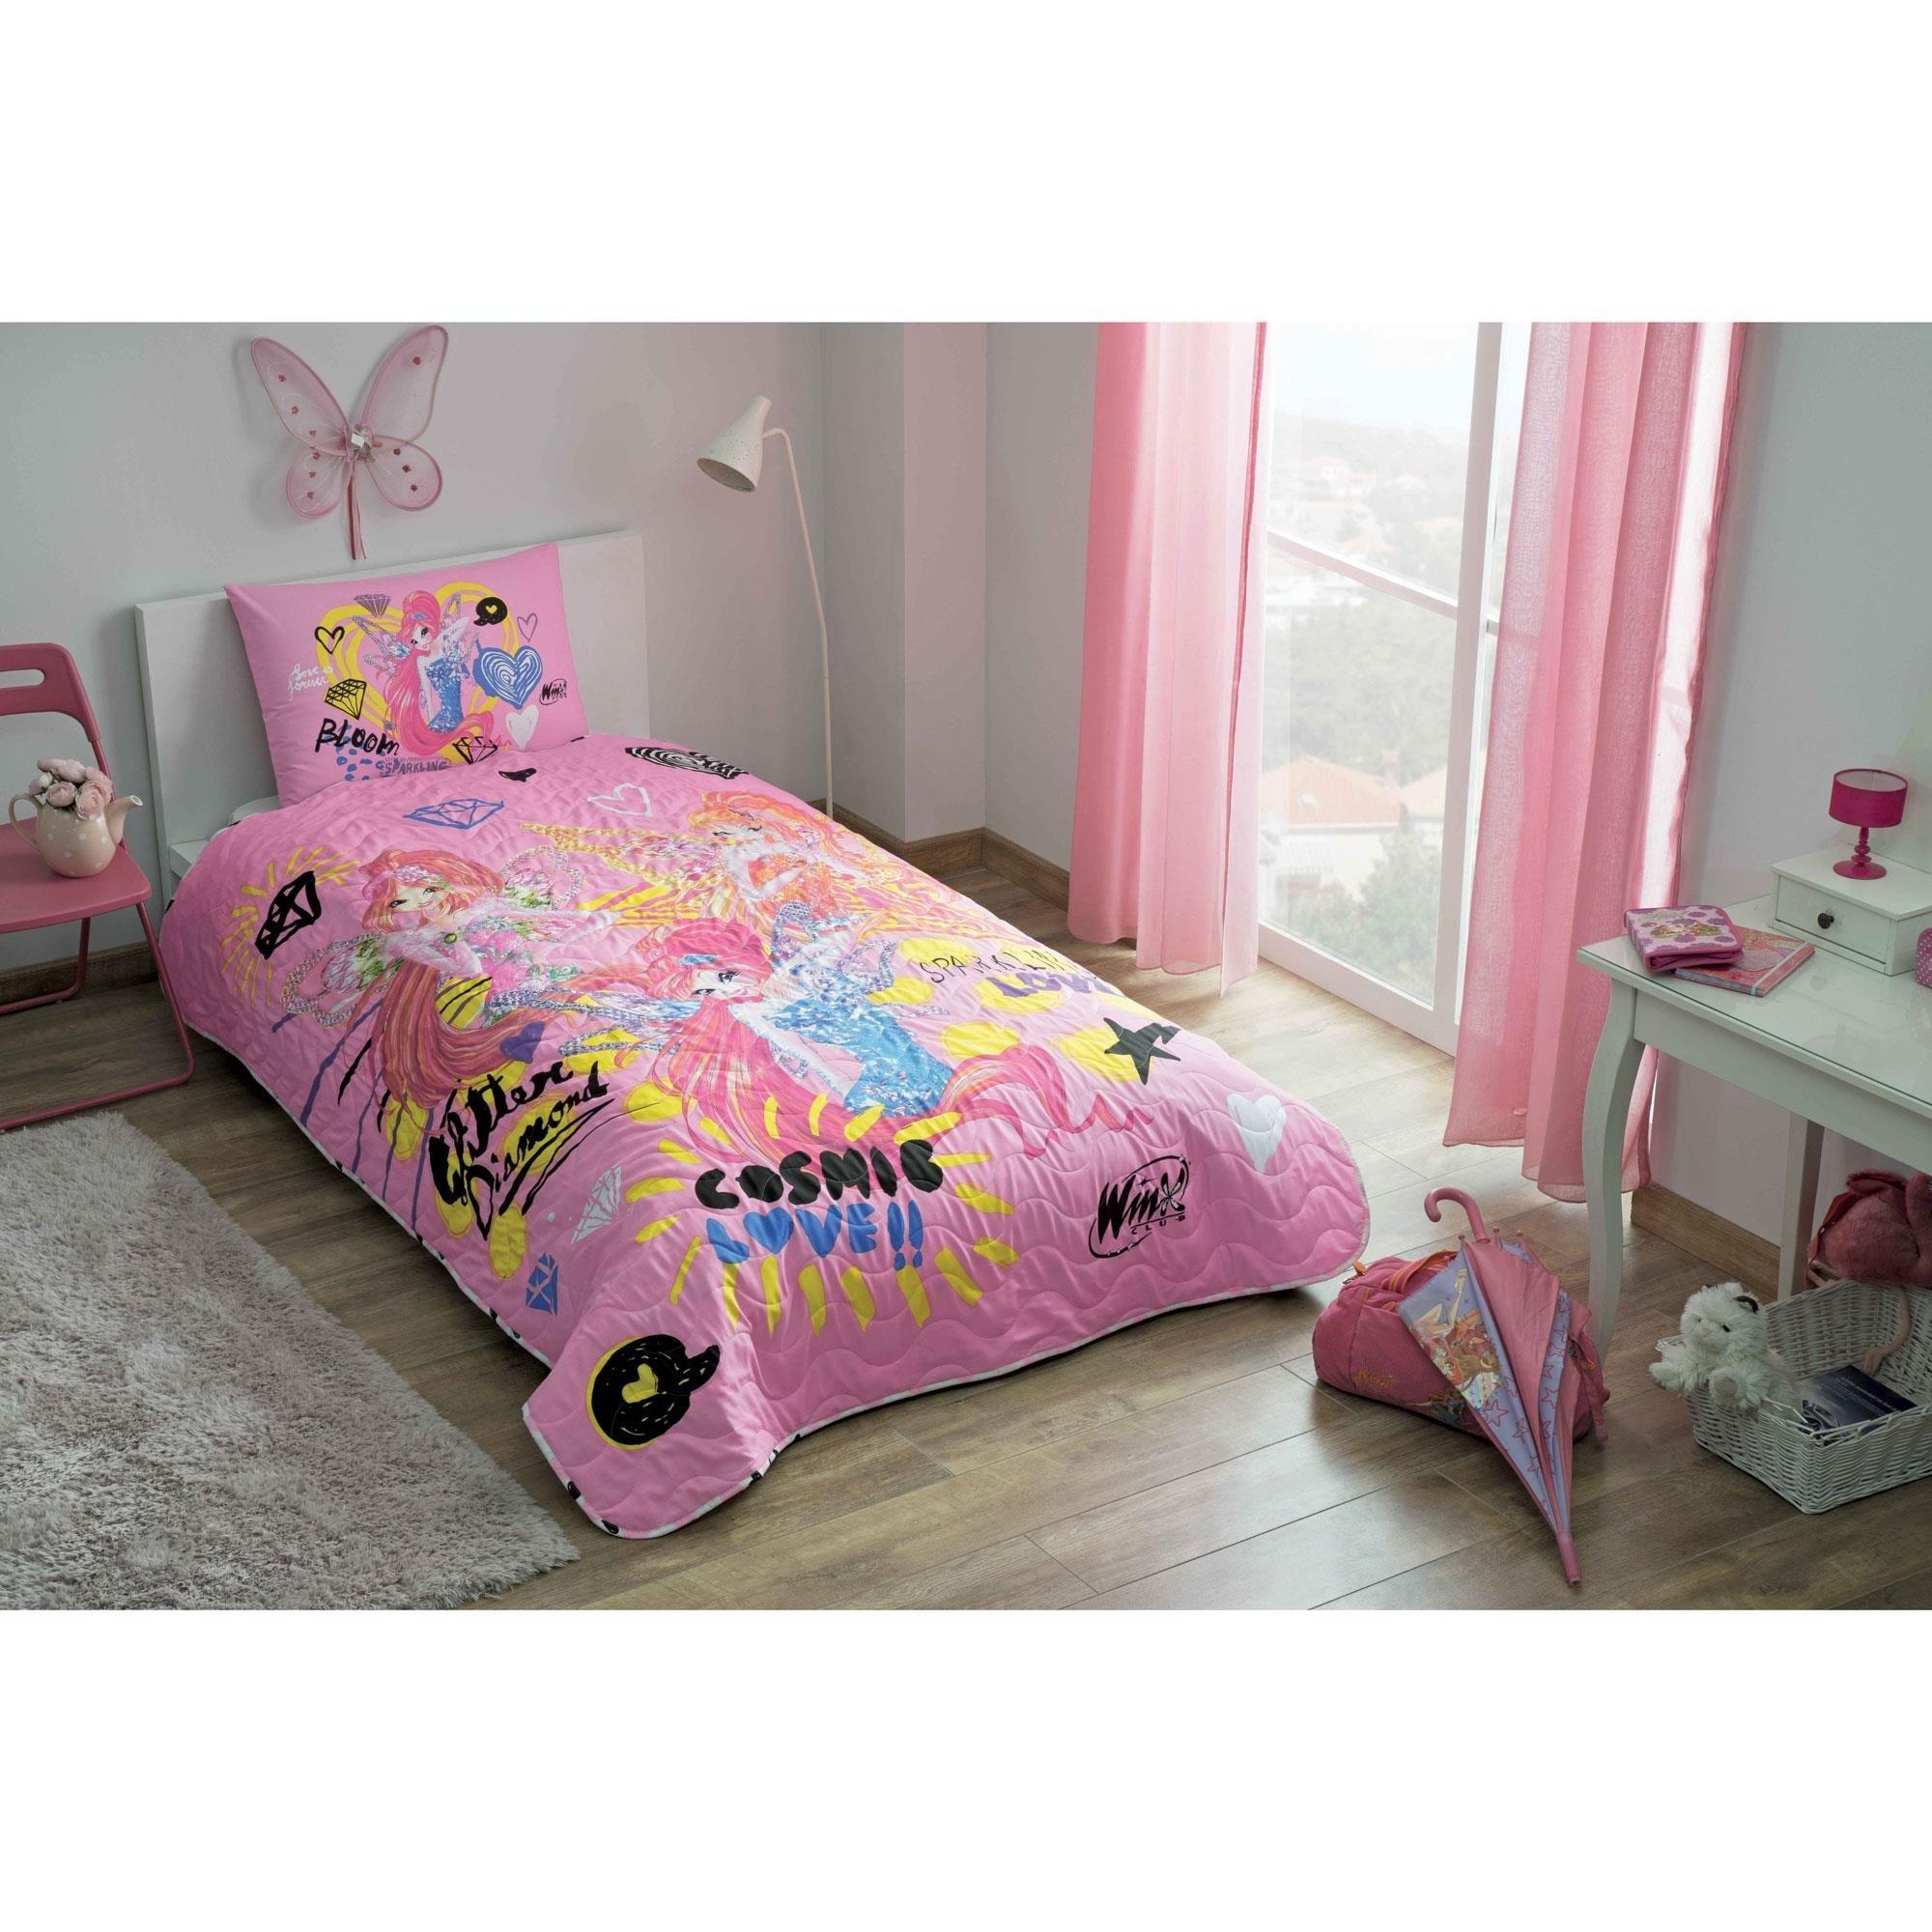 LaModaHome 2 Pcs Luxury Soft Colored Bedroom Bedding 50% Cotton Licensed Single Bedspread Set/Cosmic Love Winx Club Cartoon Girl Child/Single Bed Size